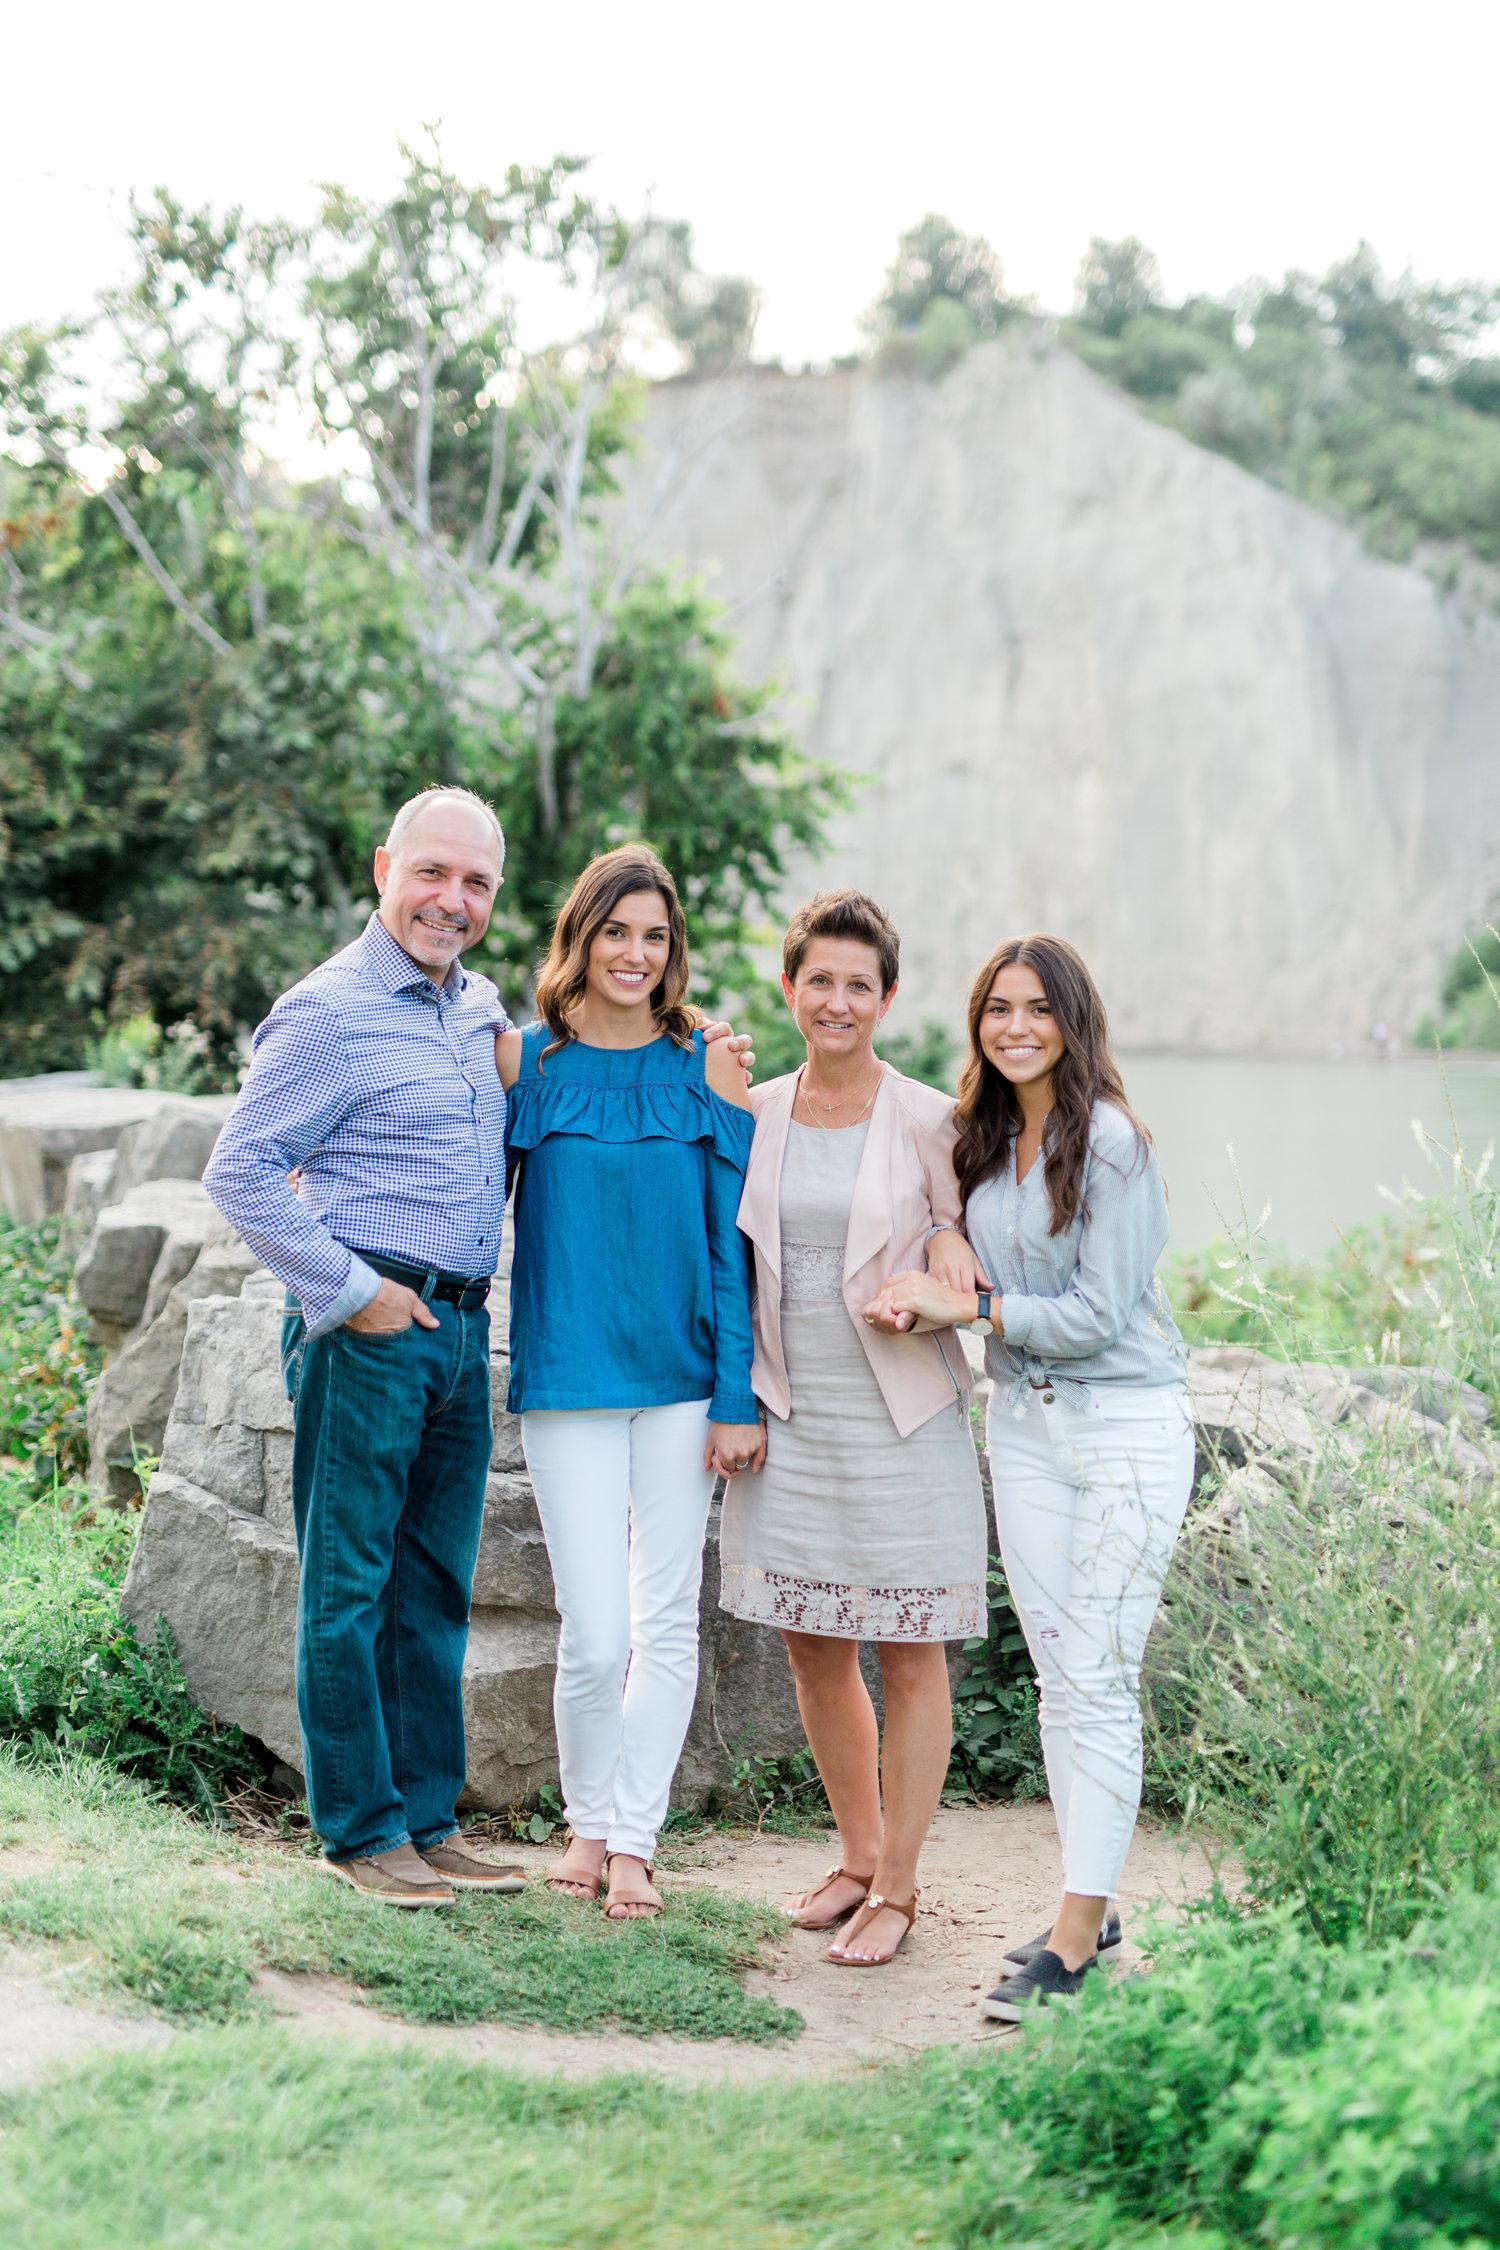 Danielle-Giroux-Amir-Golbazi-Genua-Family-Photography-Scarborough-Bluffs-9065.jpg